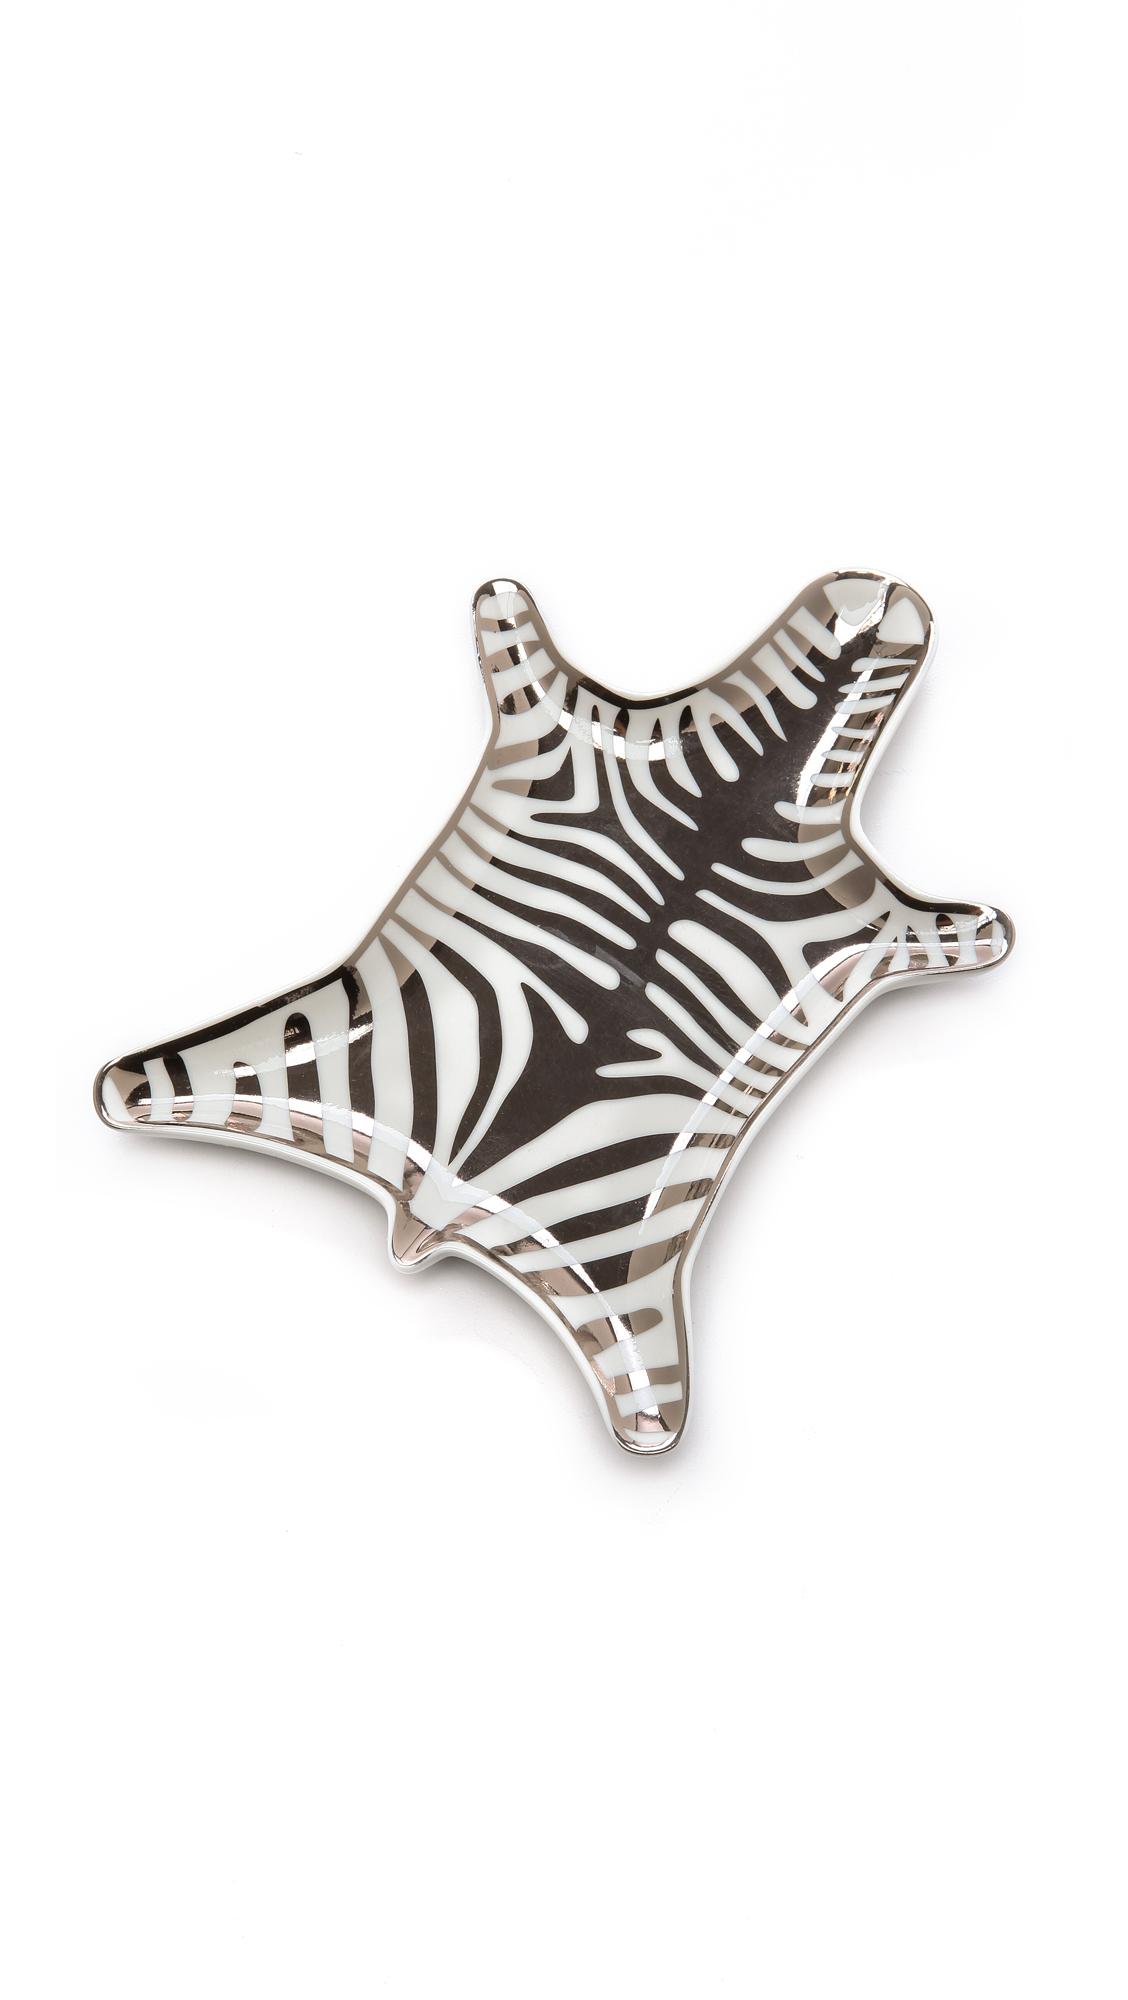 Jonathan Adler Metallic Zebra Dish - Silver